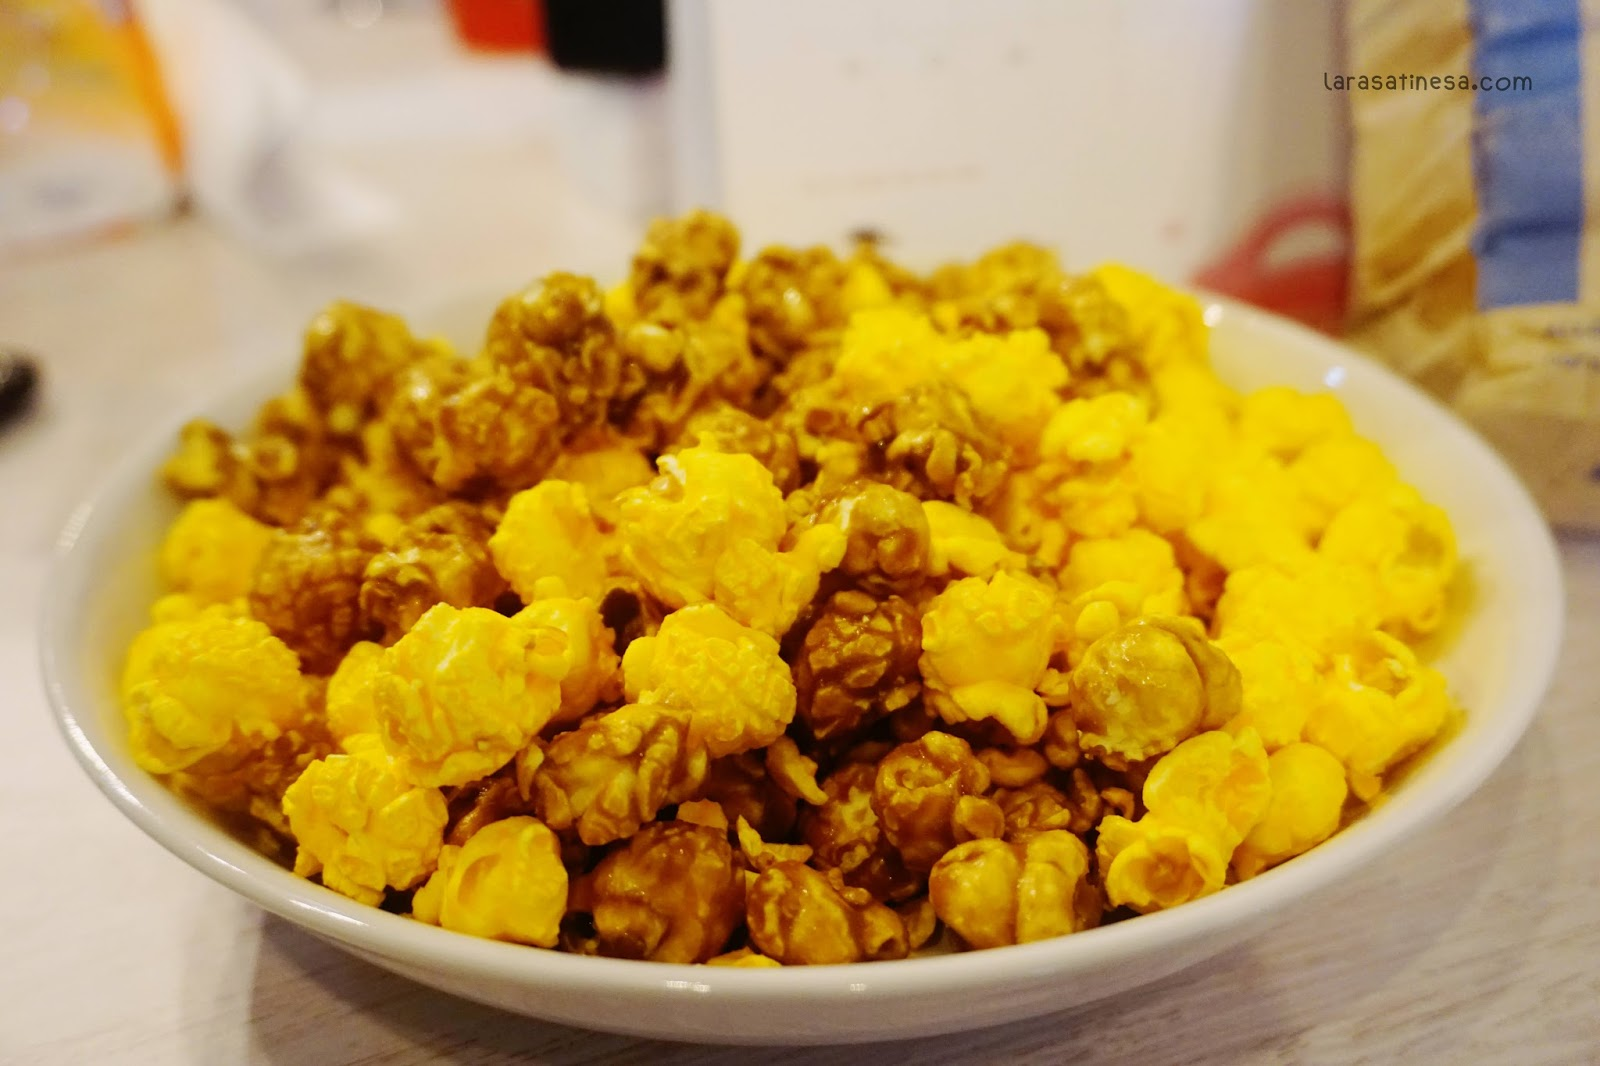 Belanja Garrett Popcorn Di Universal Studios Singapore The Happilionaire Lifestyle Blogger